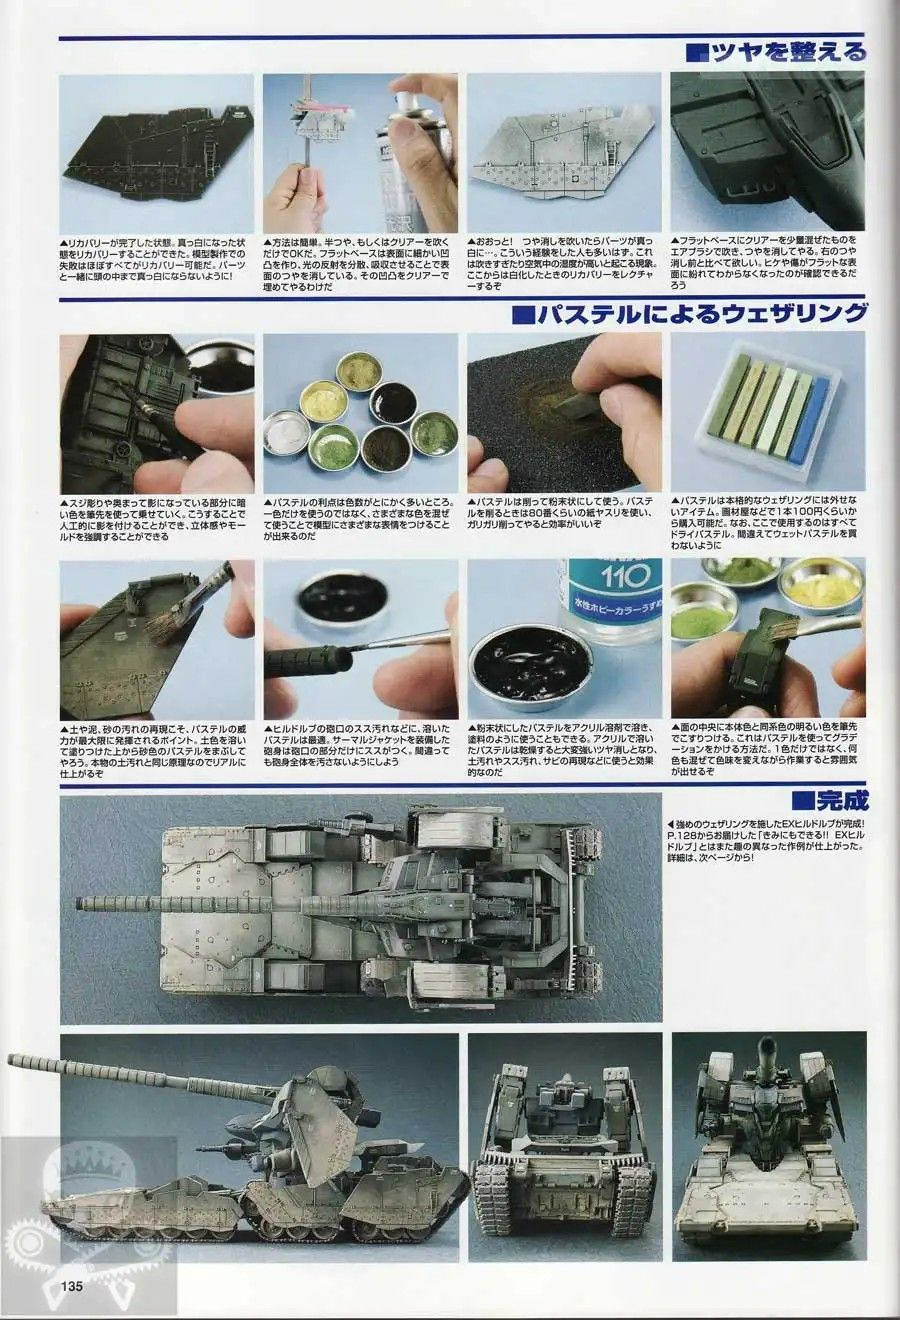 Pin by Gbx08 factory on Gunpla tutorials Mech, Tutorial, Aud